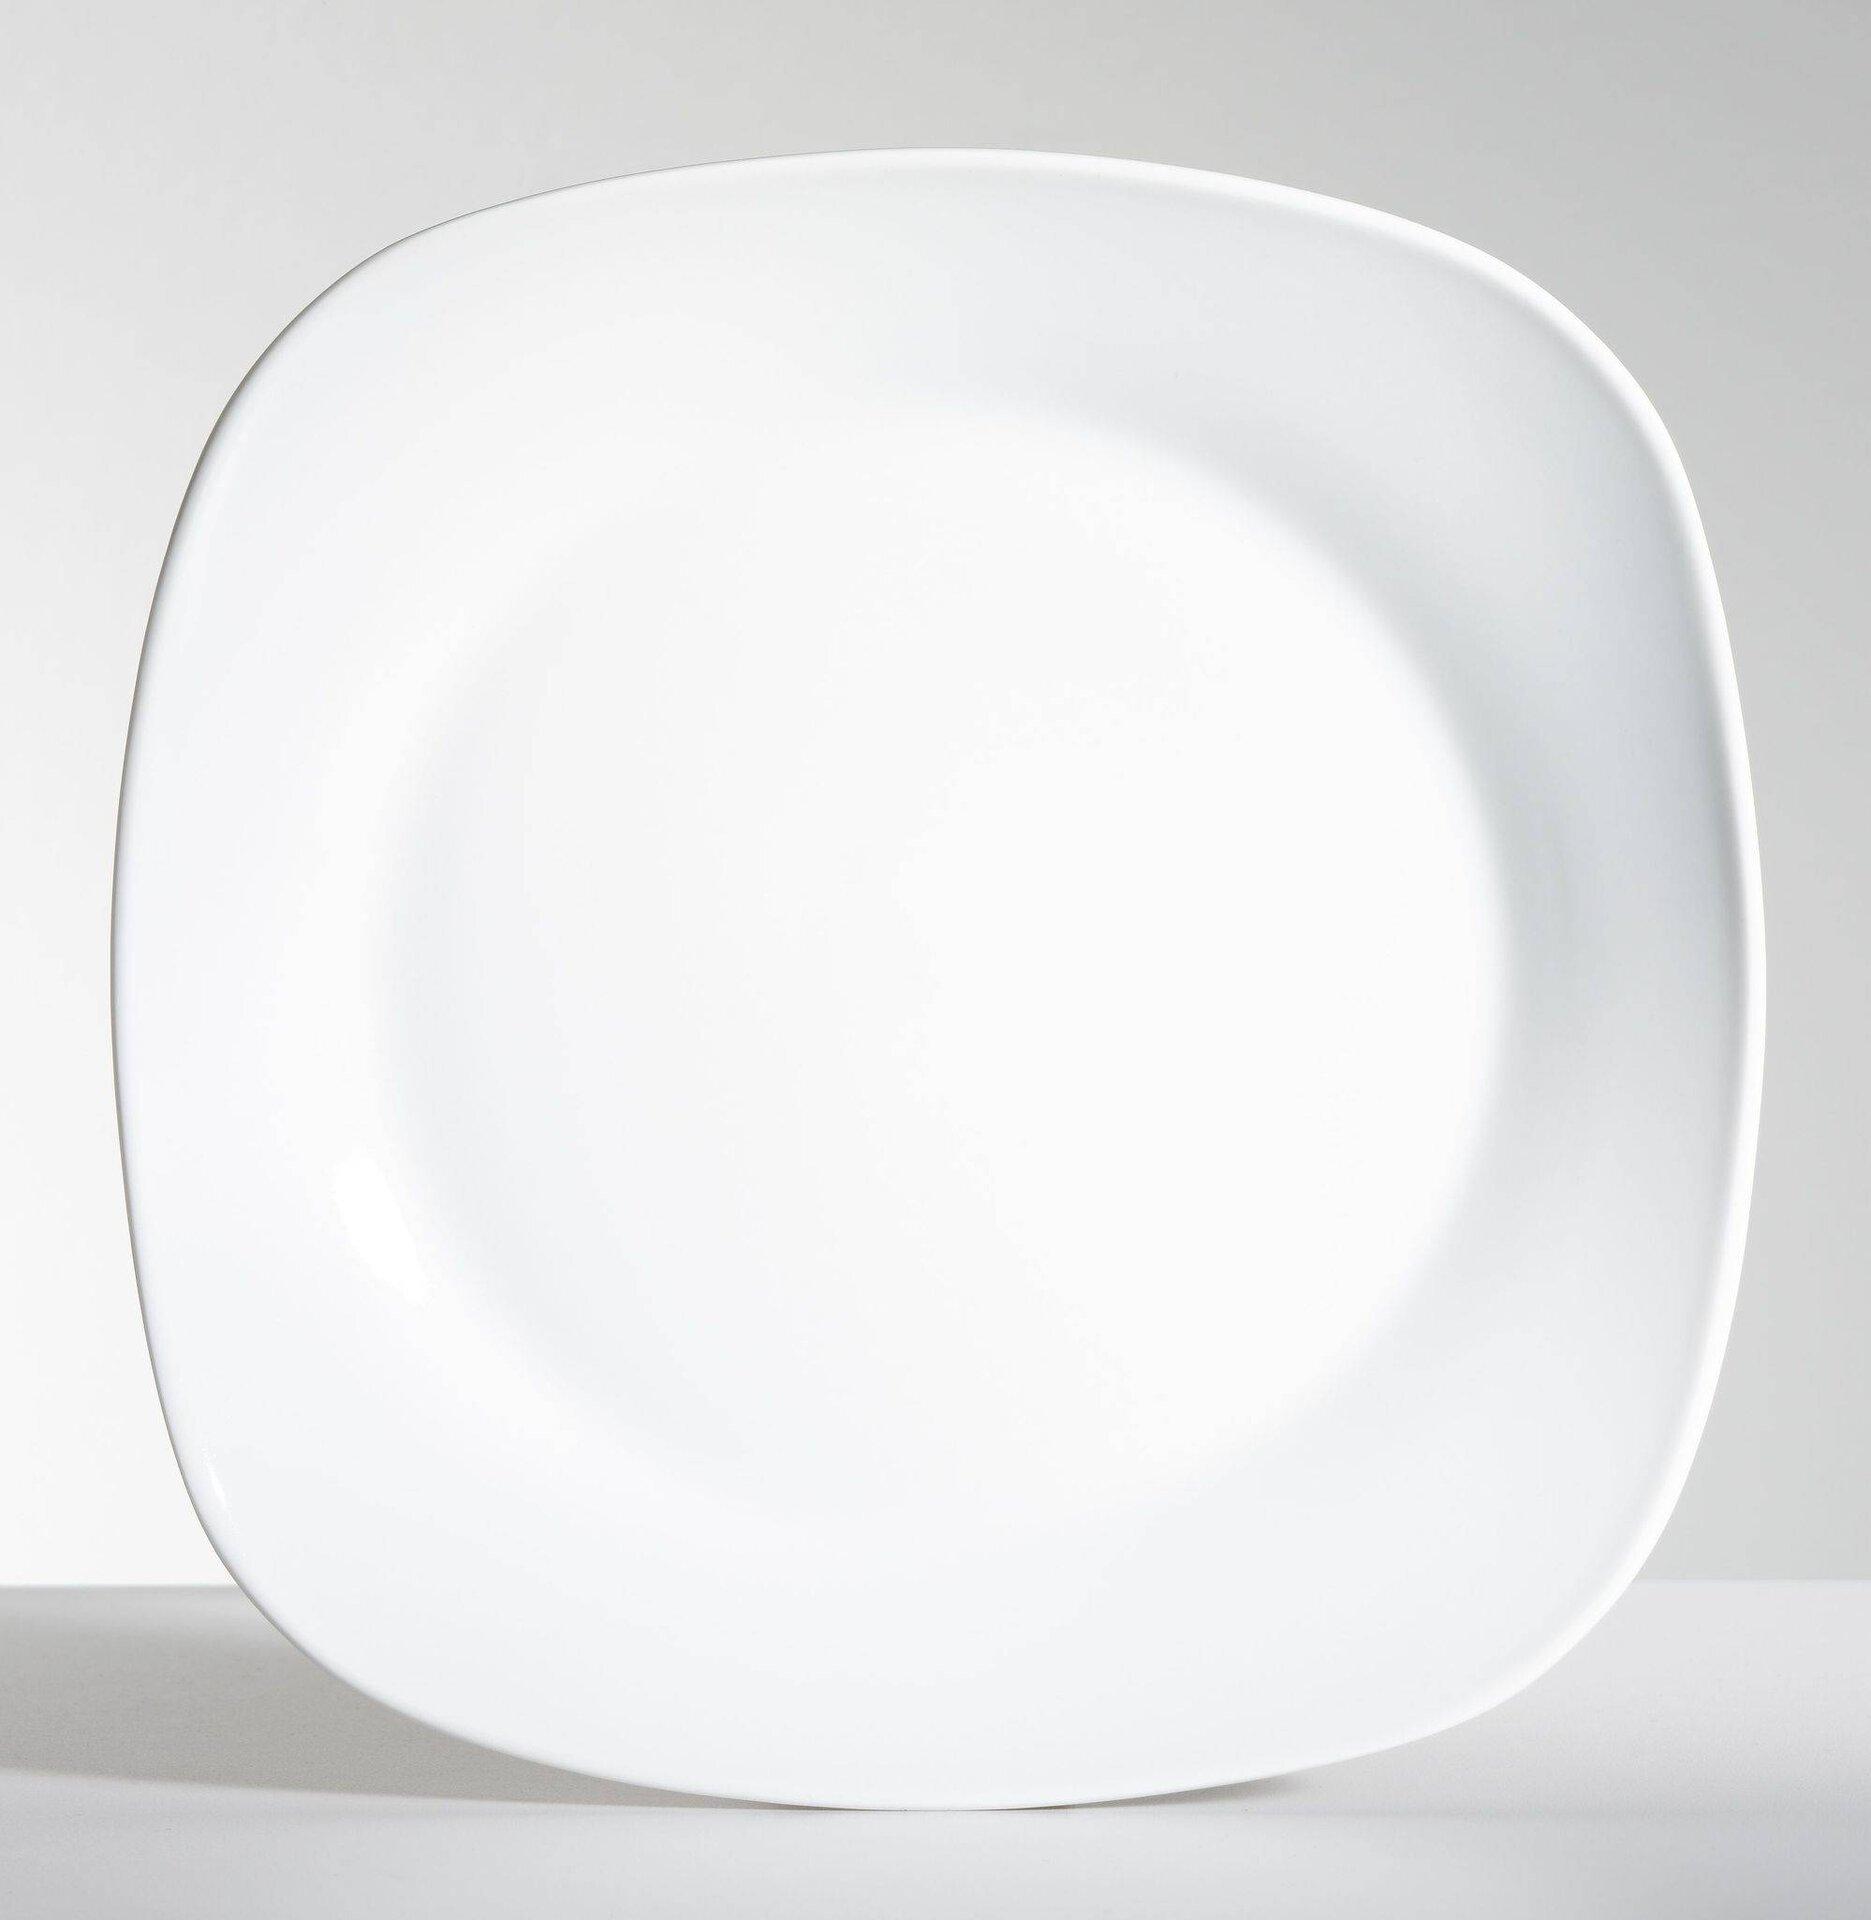 Geschirr Casa Nova Keramik weiß 24 x 24 cm